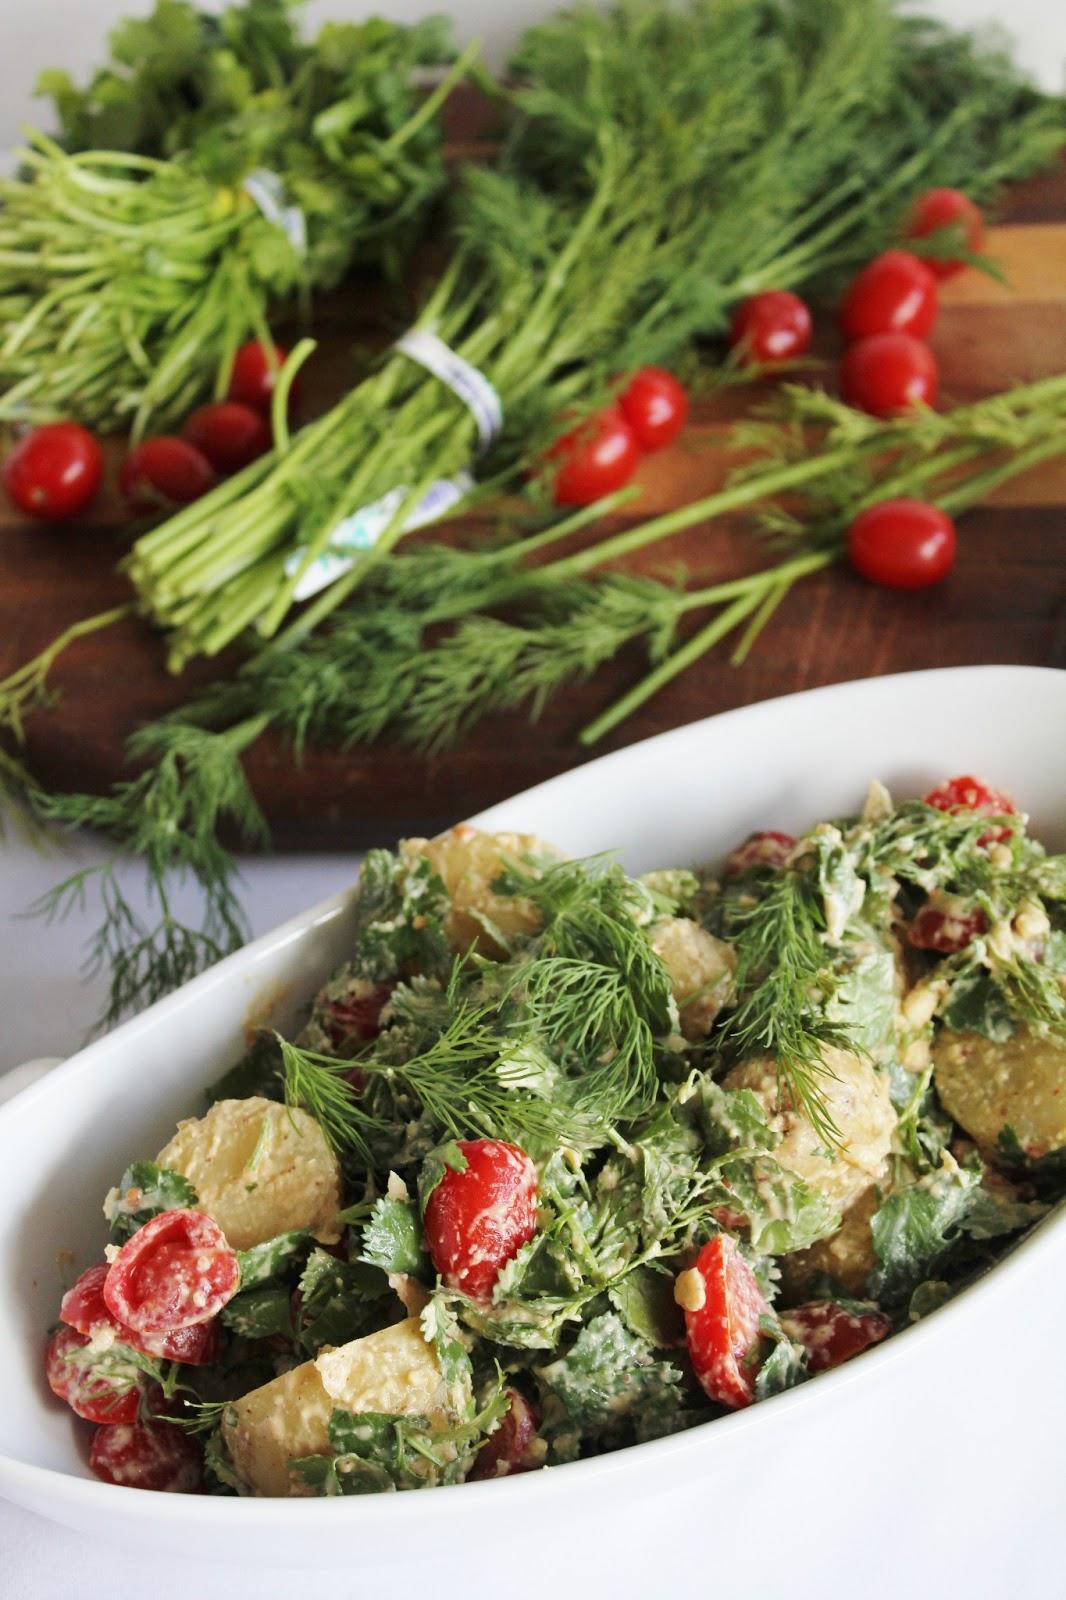 This Rawsome Vegan Life Potato Salad With Cilantro Dill